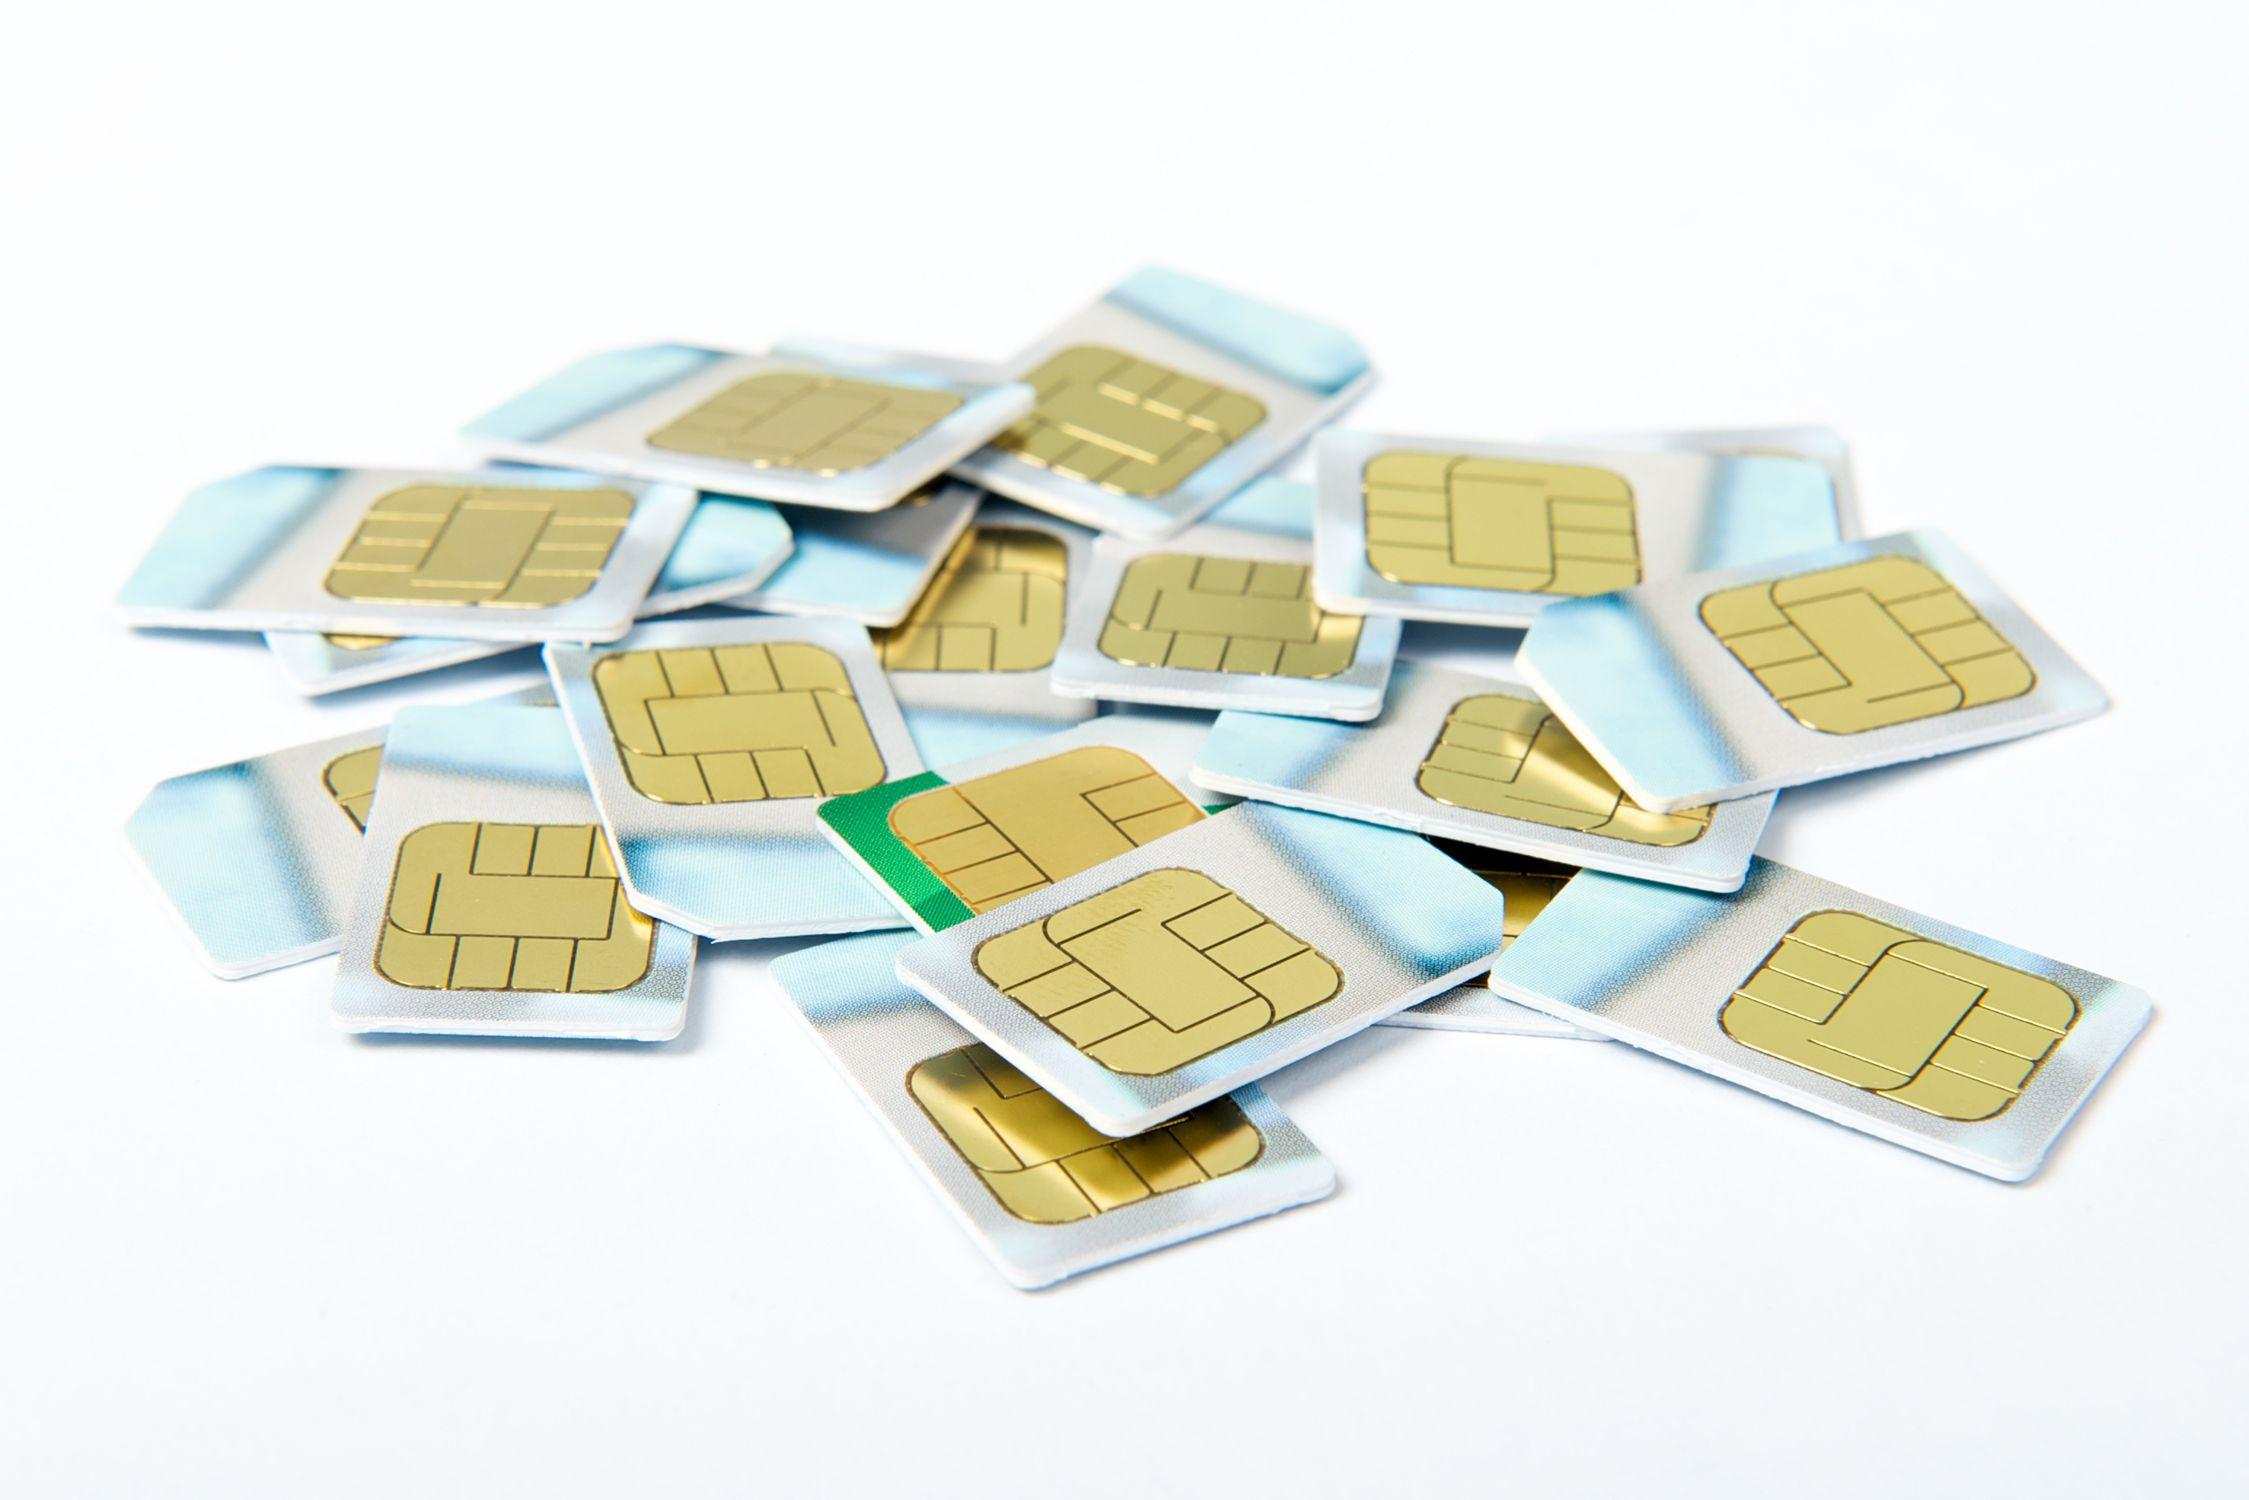 iphone sim card 581c776b3df78cc2e859a5e8